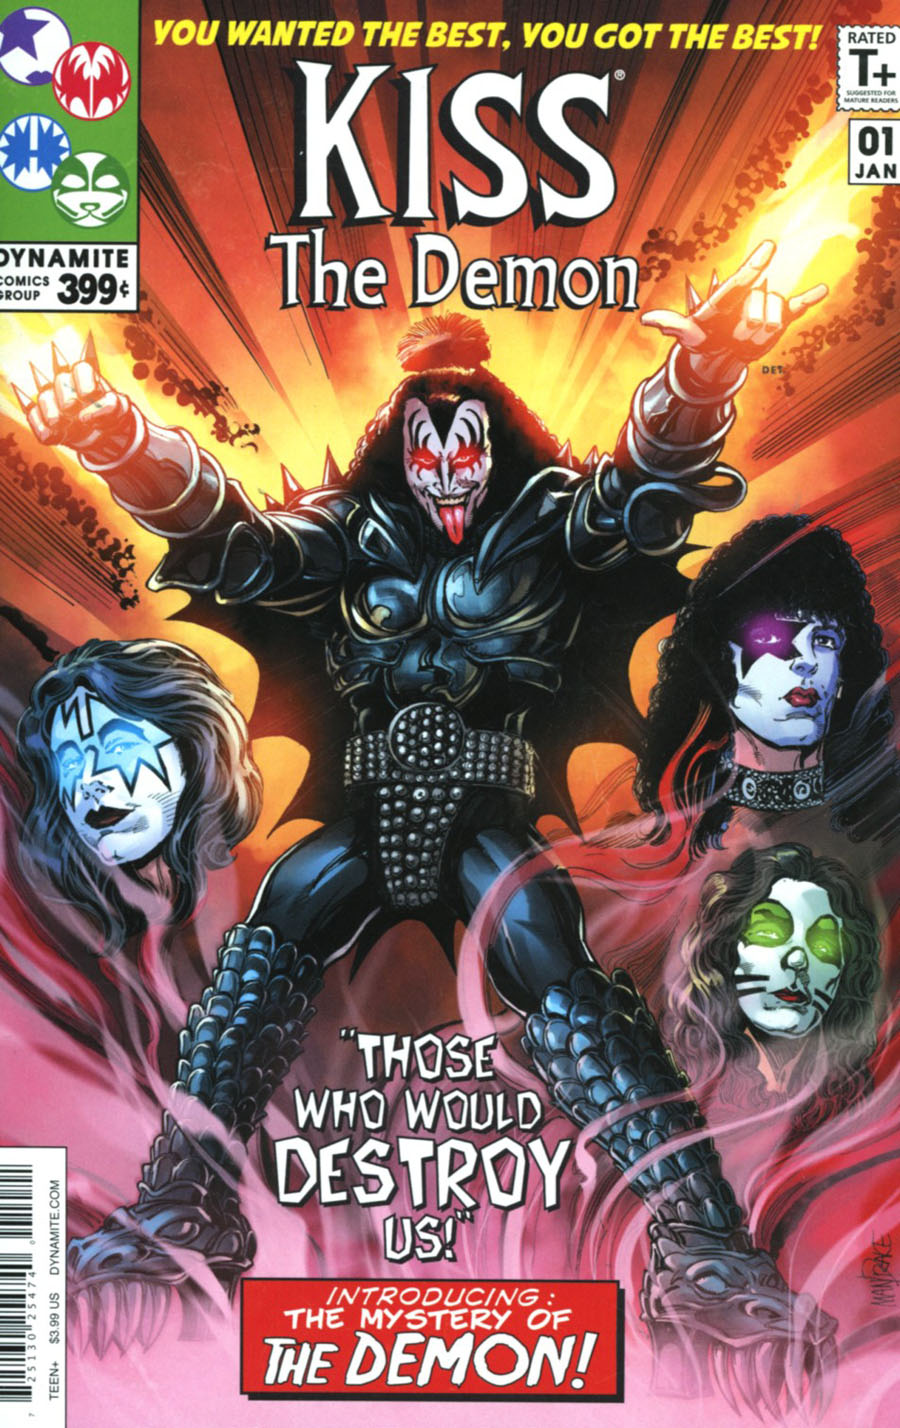 KISS The Demon #1 Cover B Variant Tom Mandrake Fantastic Four Homage Cover